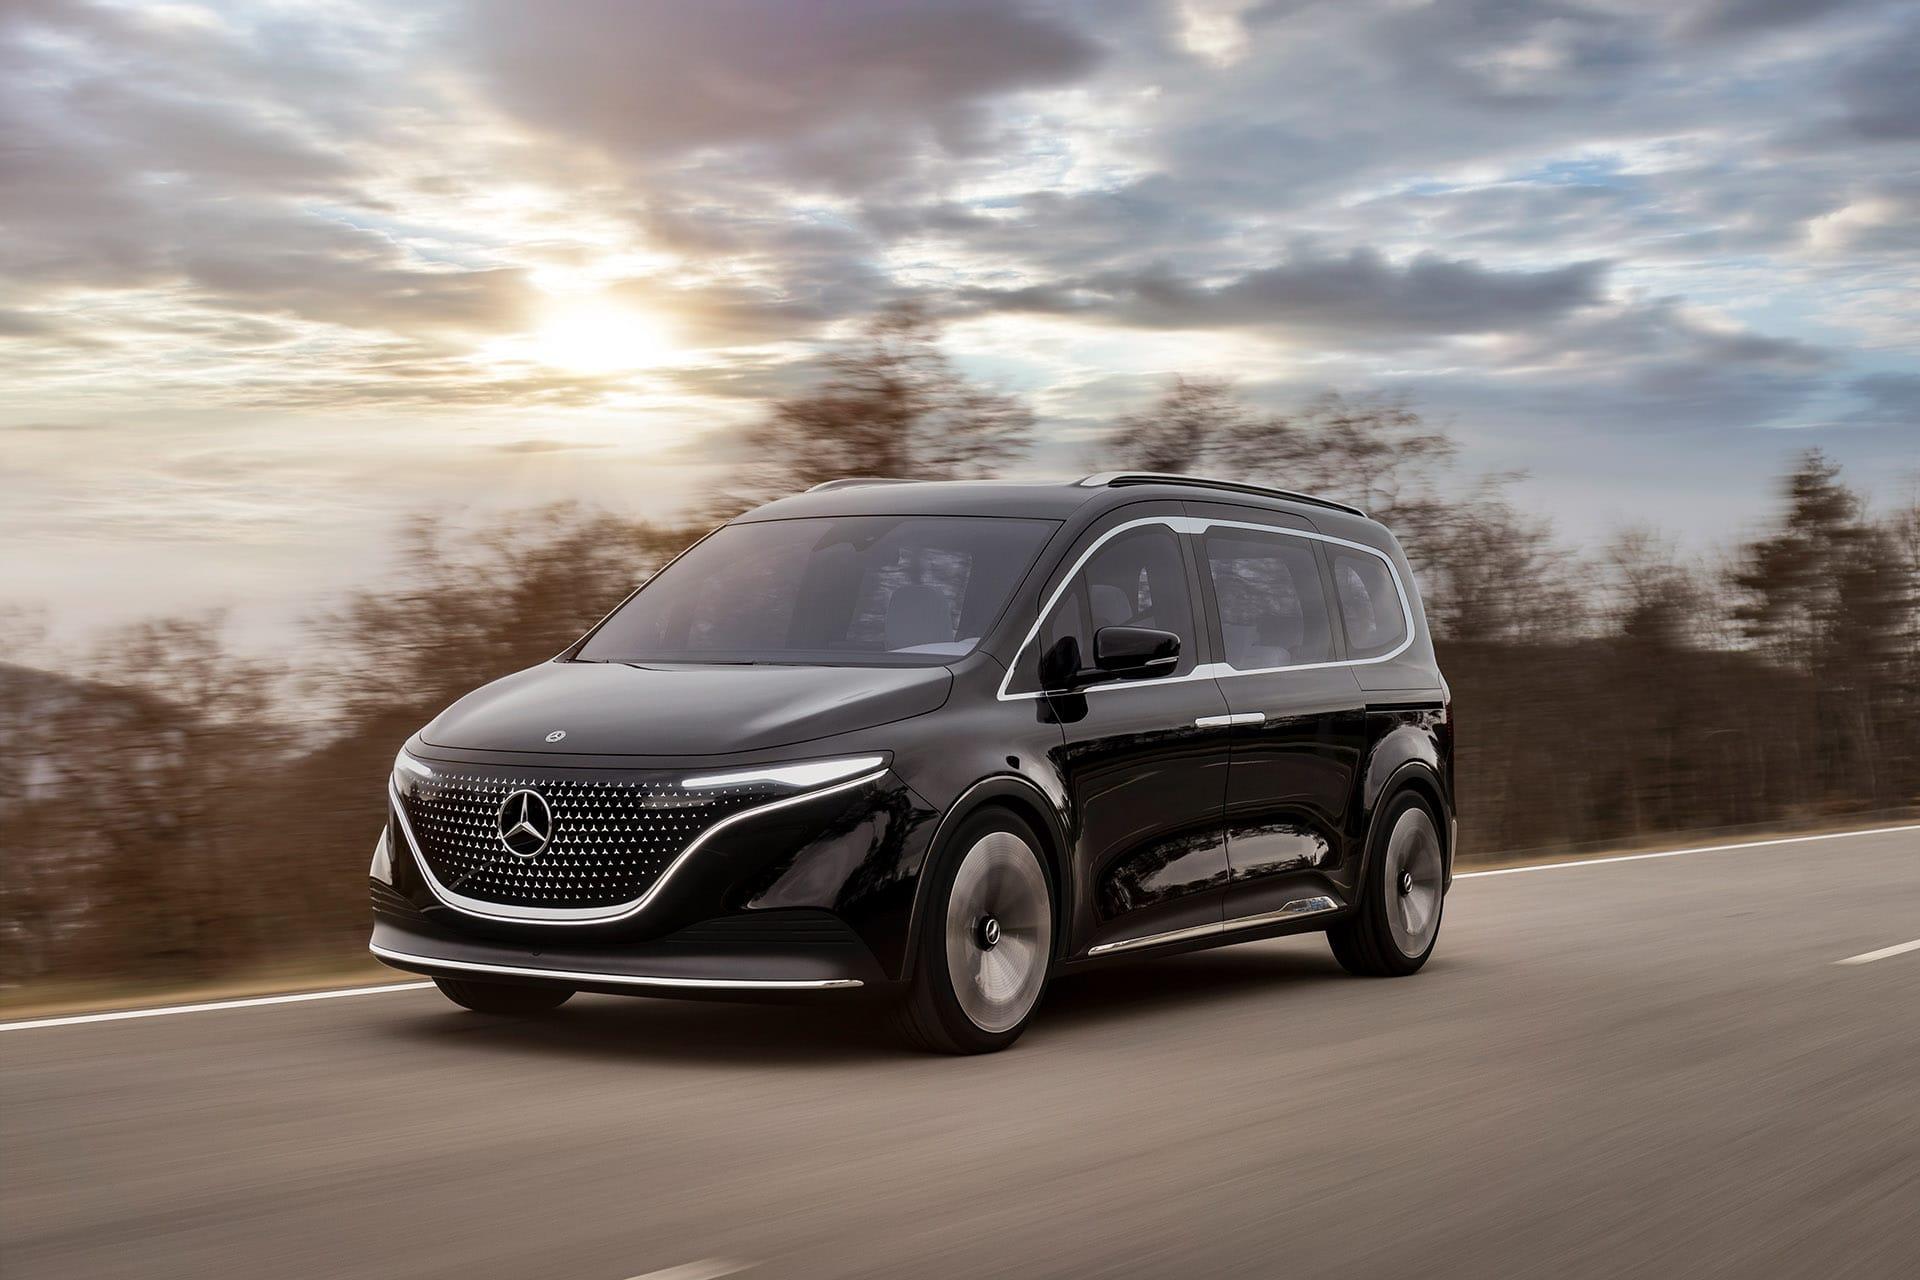 Mercedes-Benz Concept EQT - прем'єра нового електричного концепту